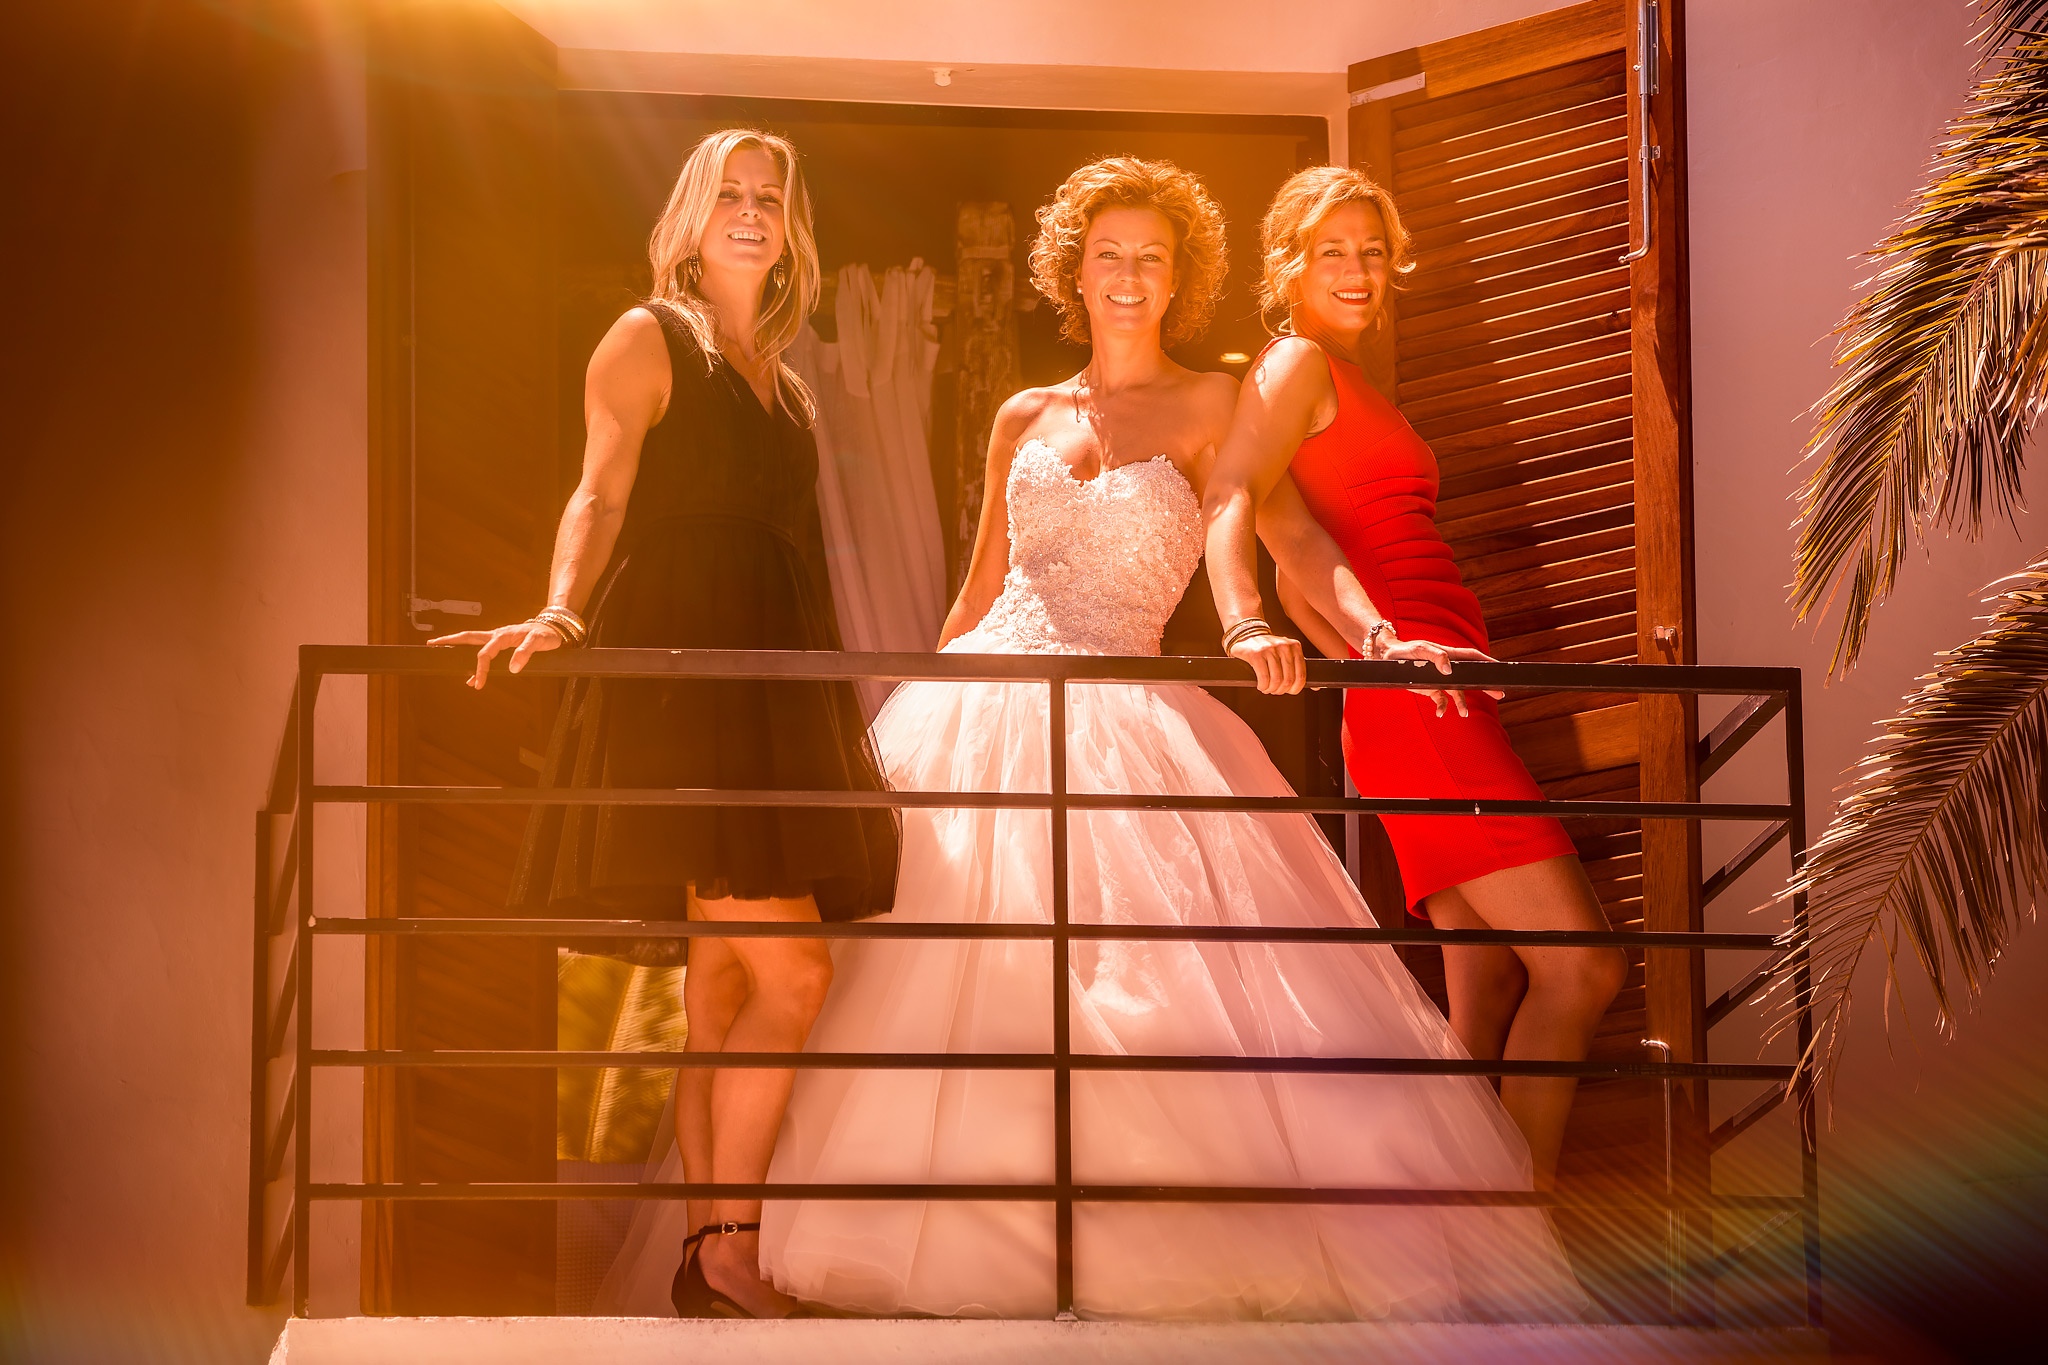 Bruidsreportage Destination Wedding Ibiza Mandy en Joost 007 - Bas Driessen Fotografie